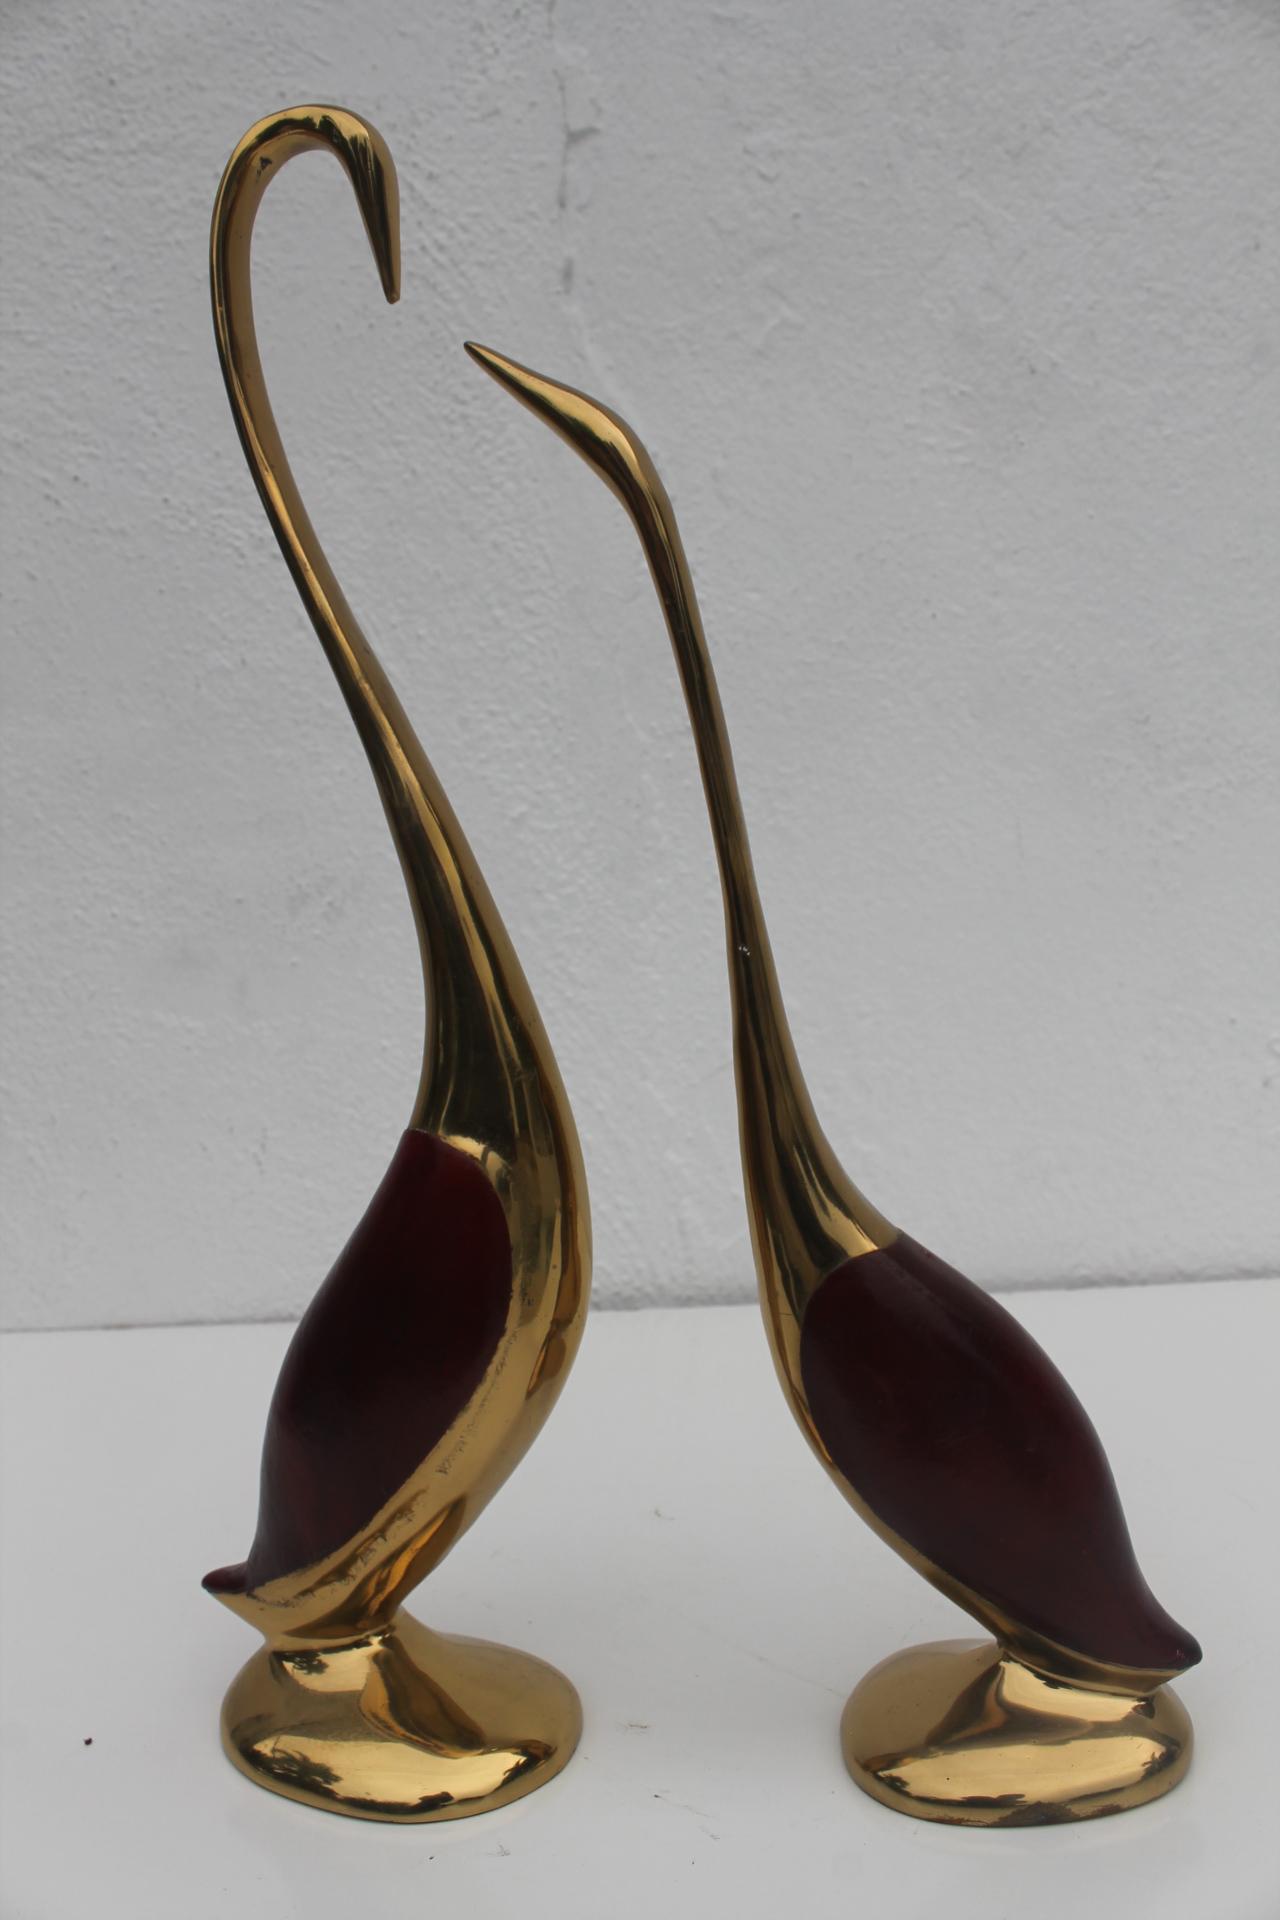 Vintage Brass Cranes Decorative Table Sculptures A Pair   Image 2 Of 7